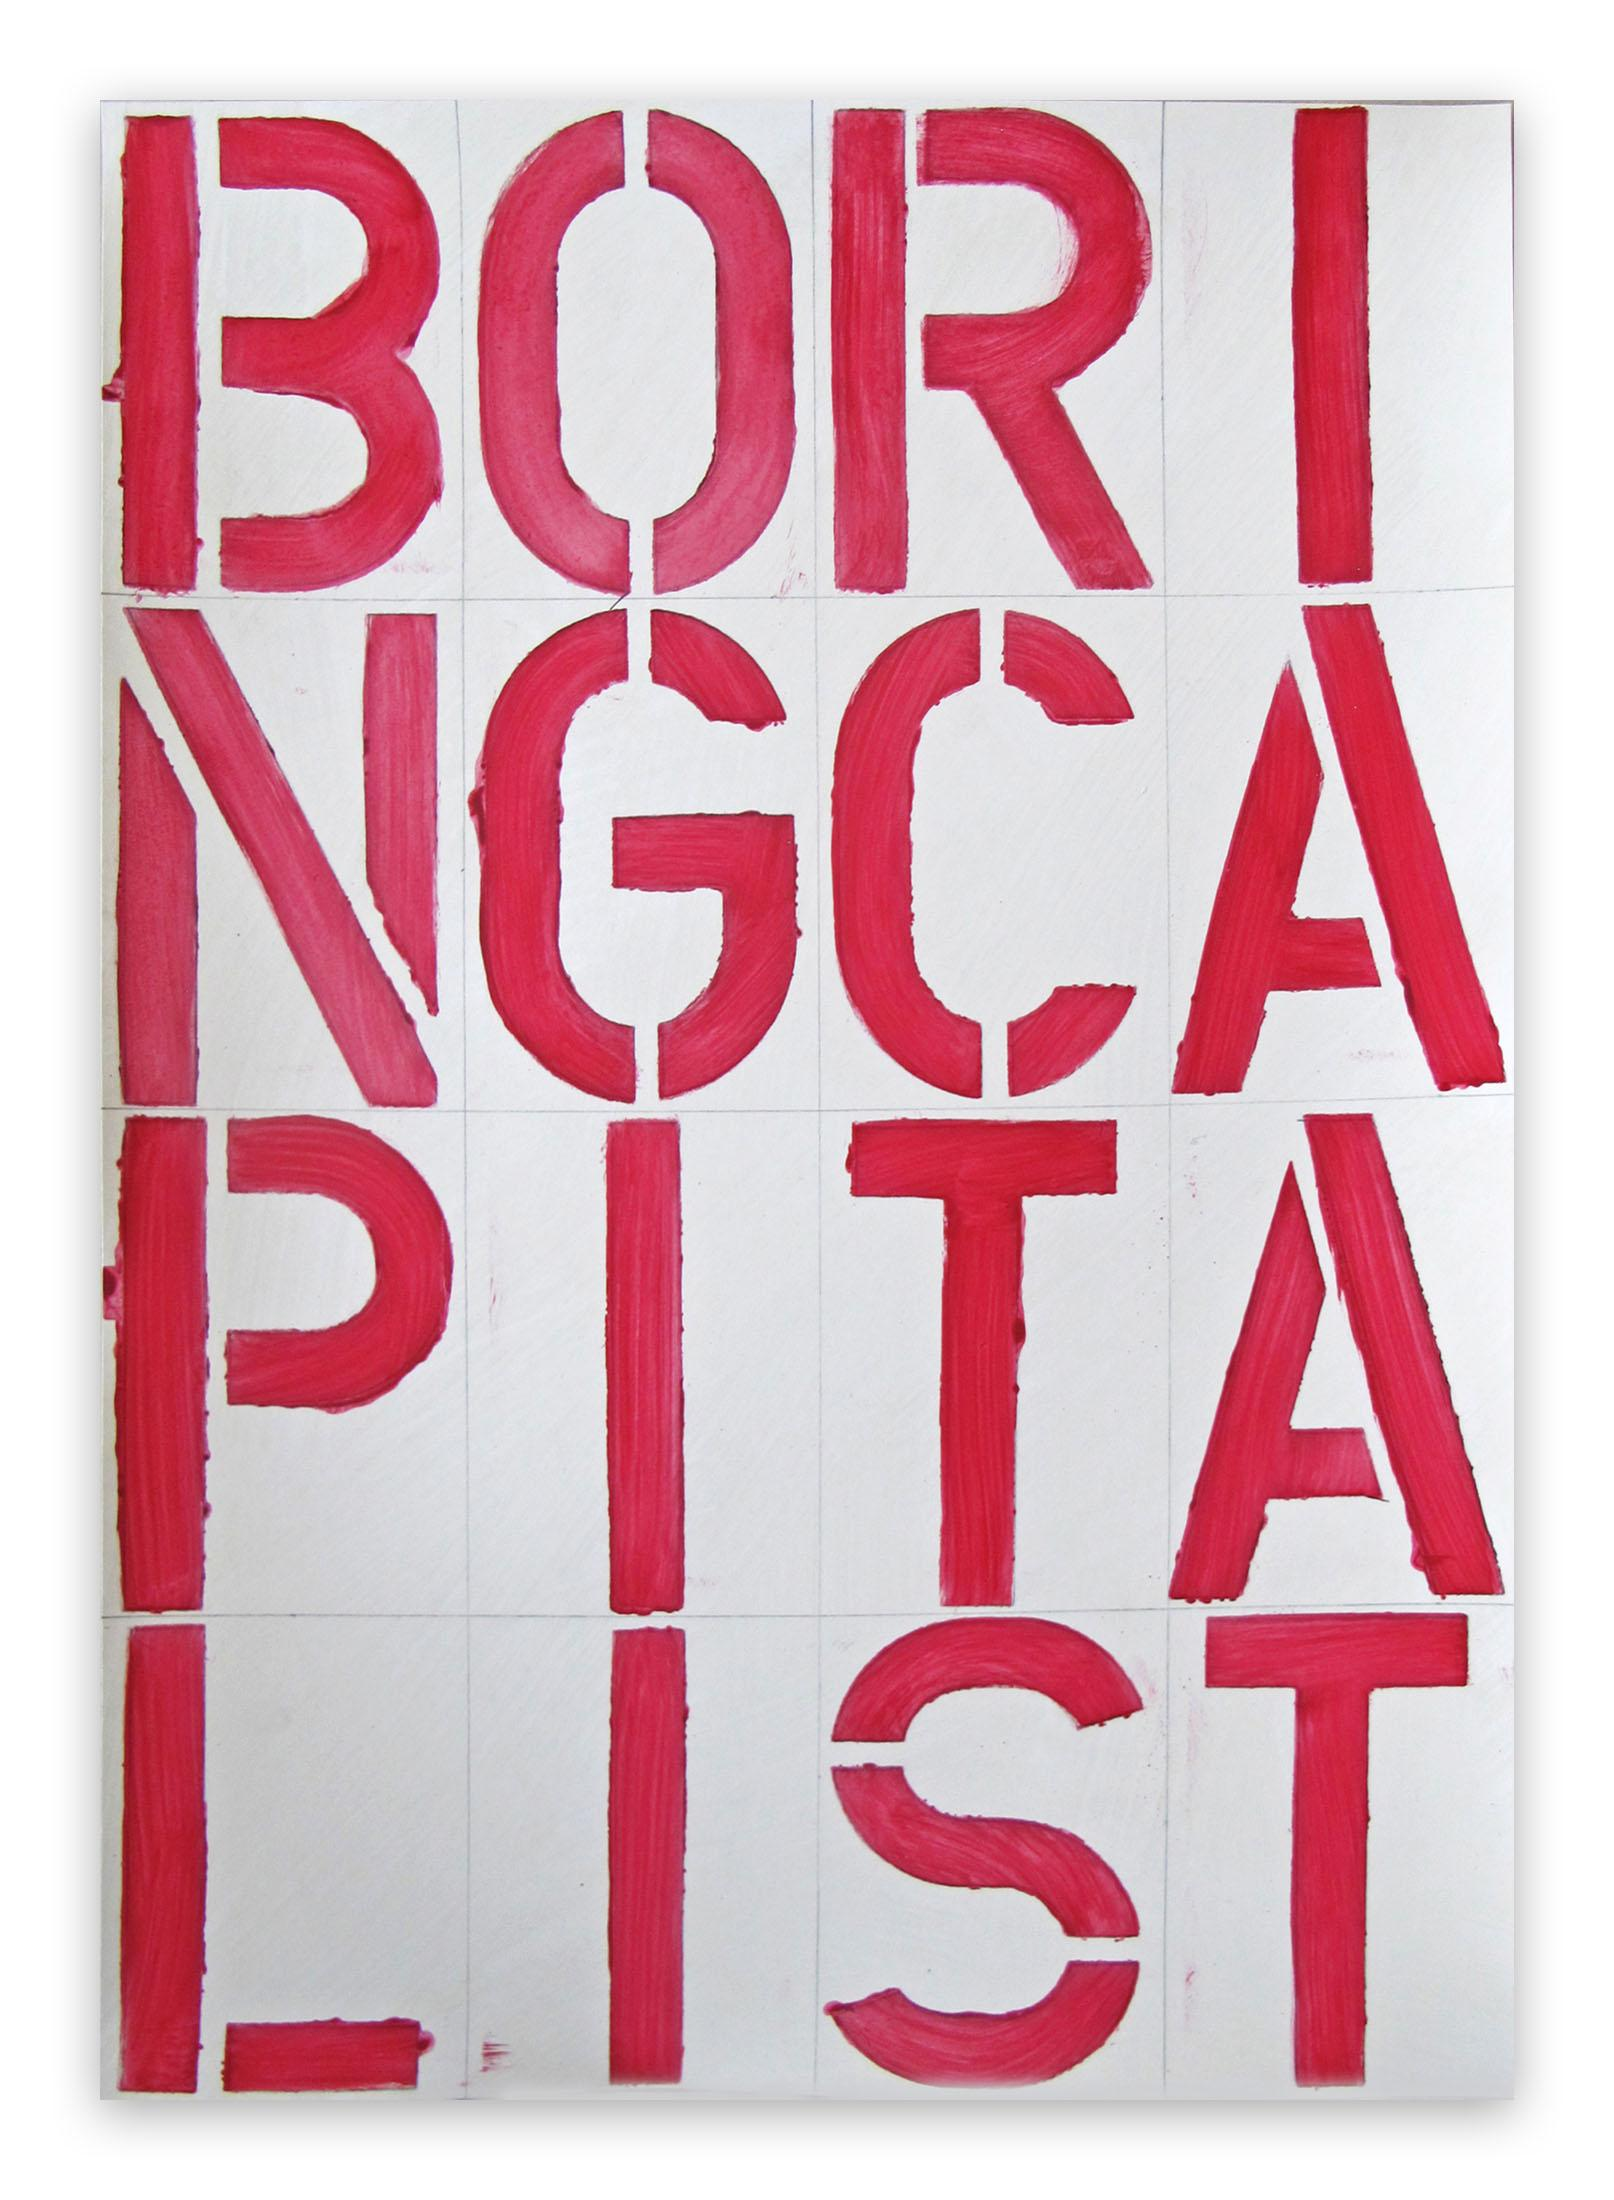 BP18, BORINGCAPITALIST, 2019 (Abstract painting)